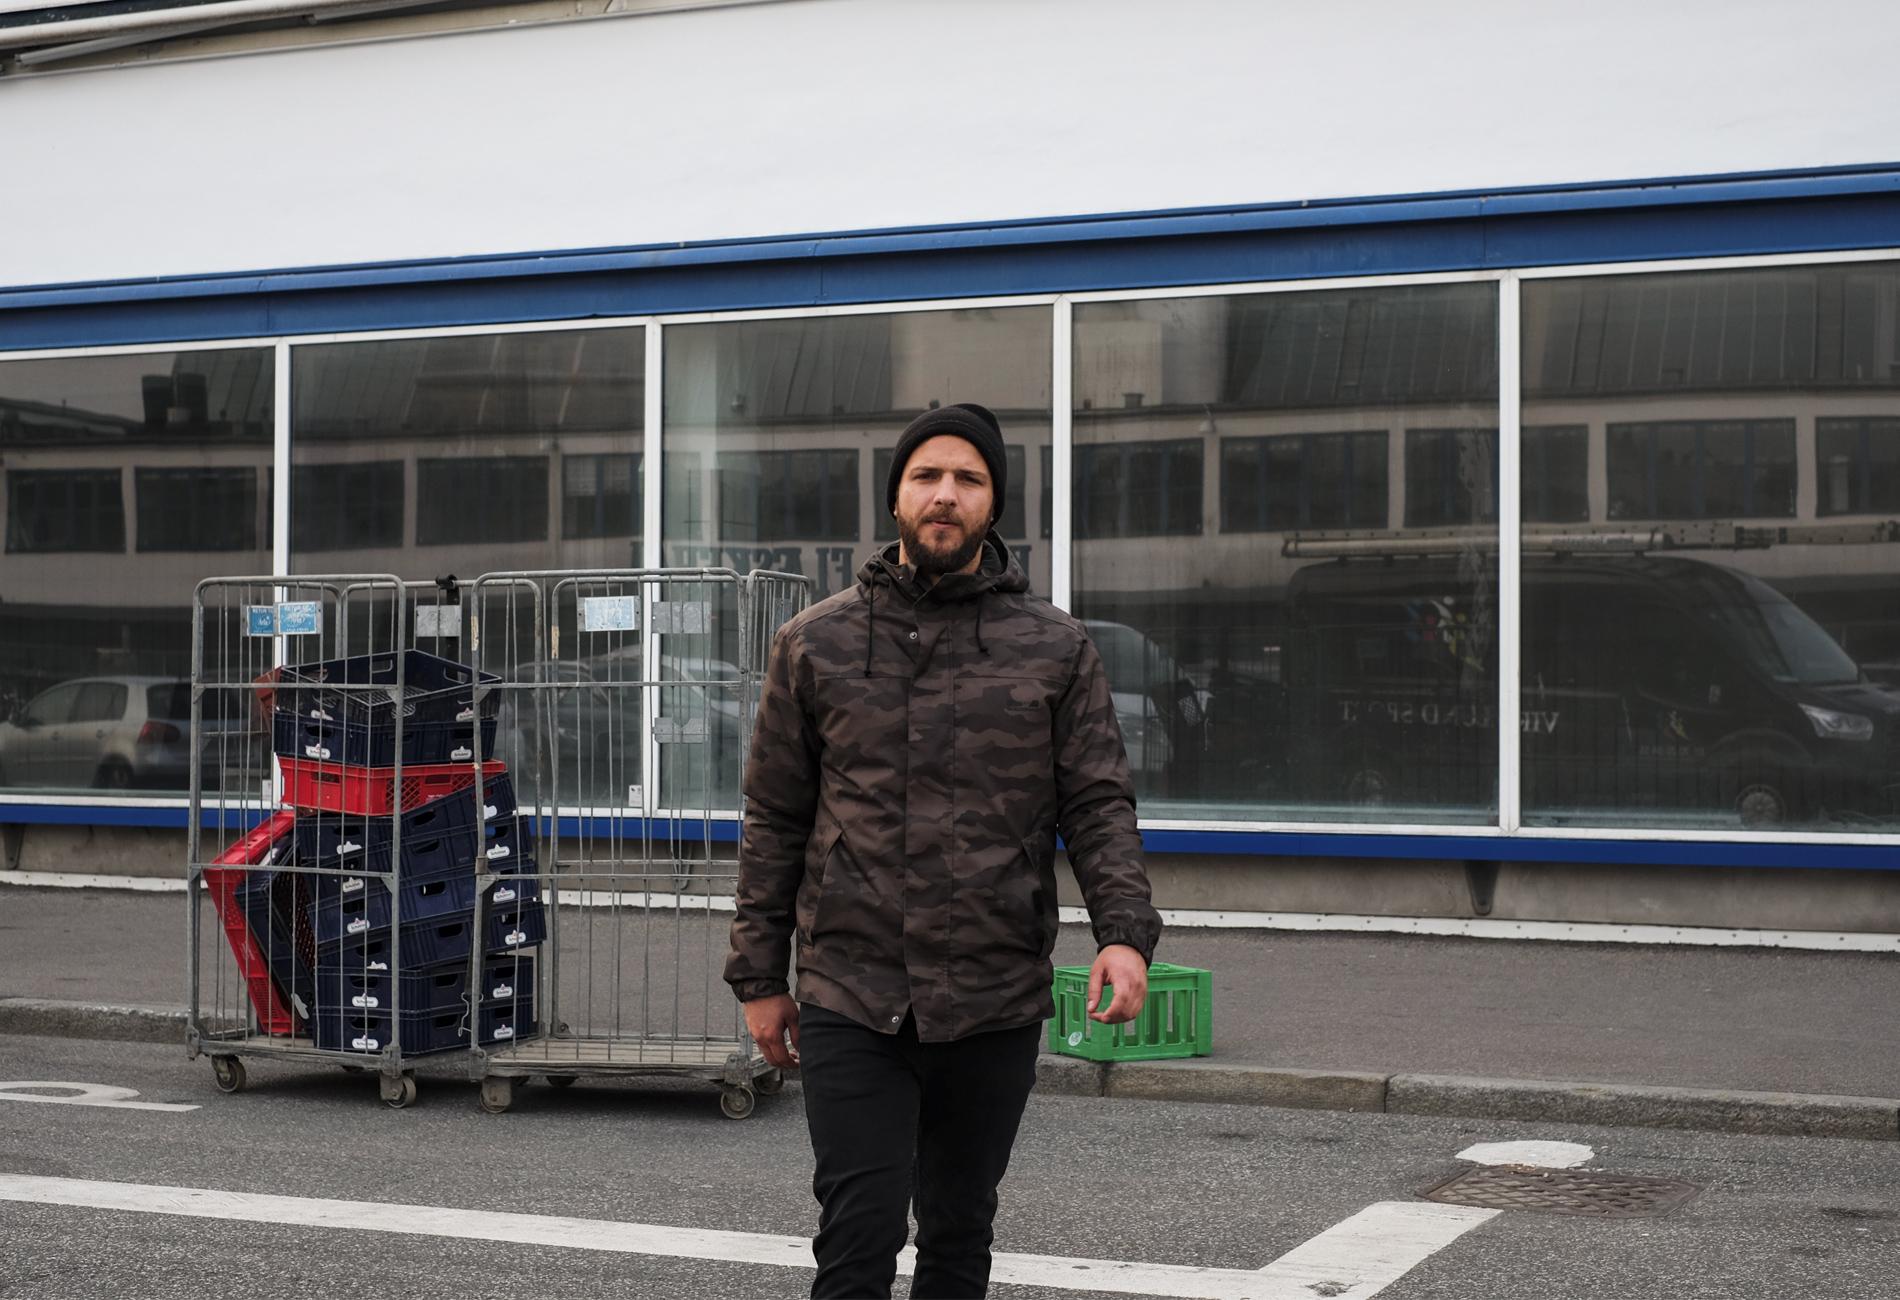 basilio walking